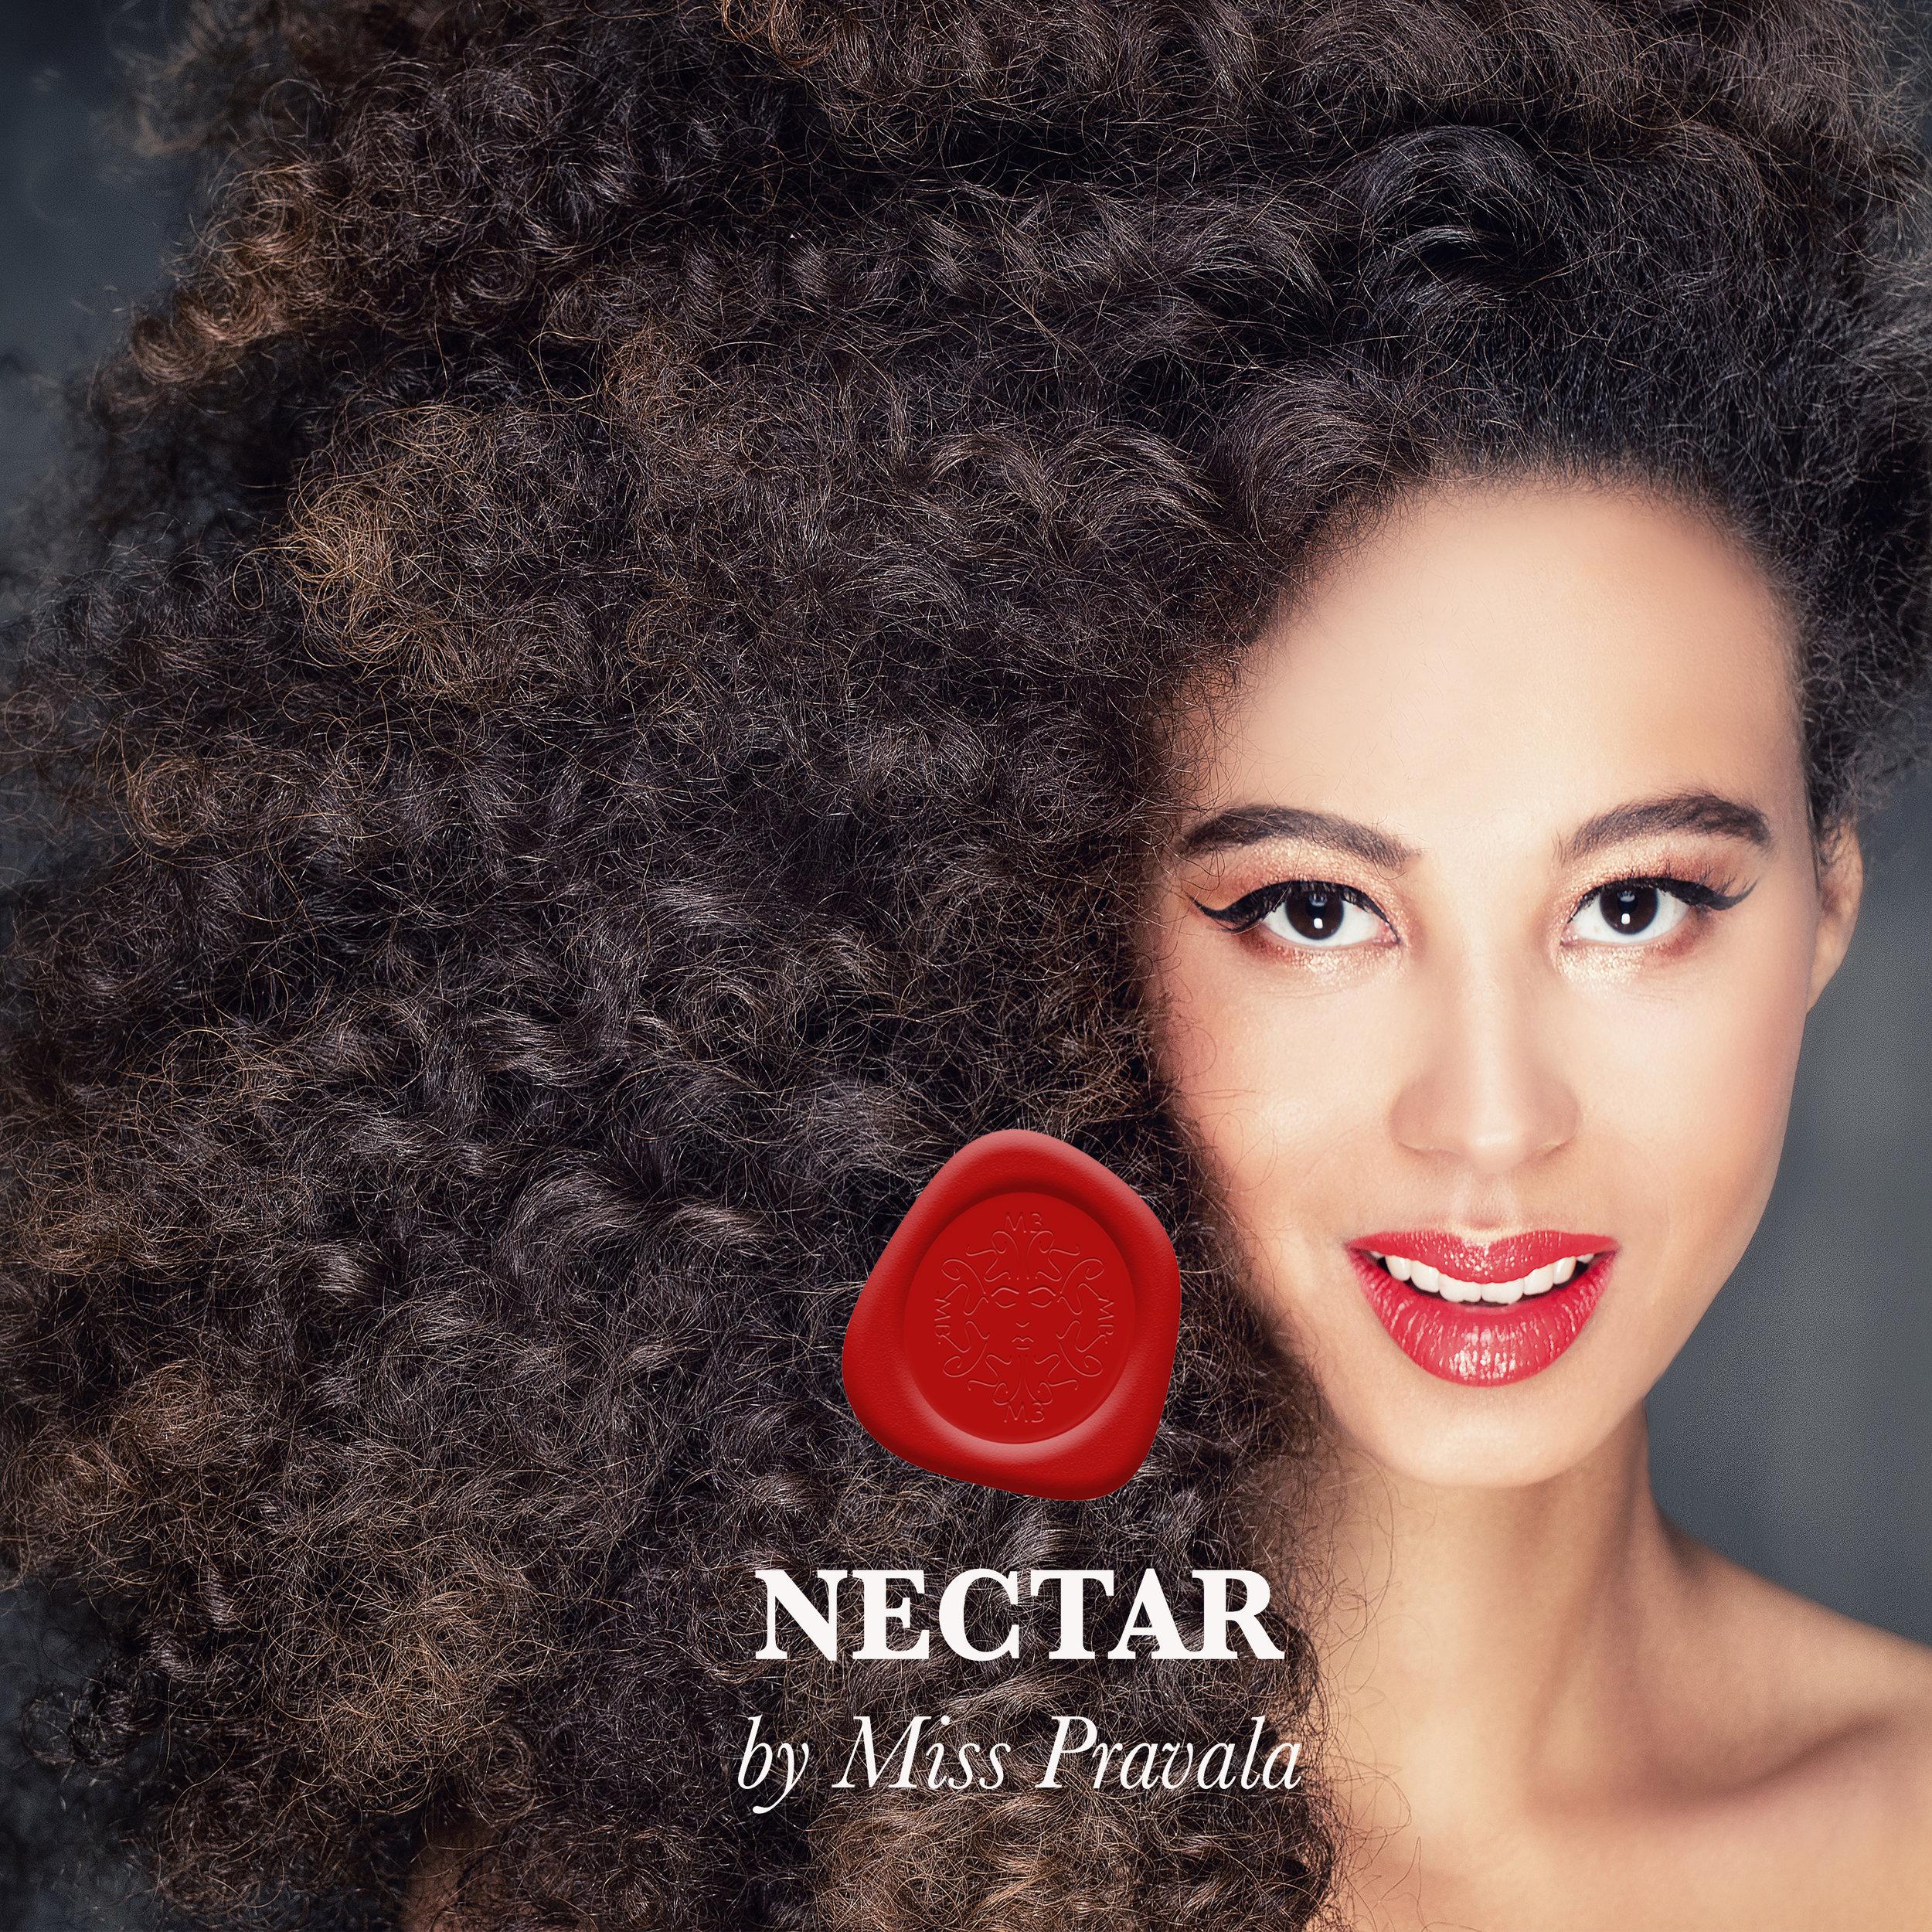 Nectar by MP 2.jpg